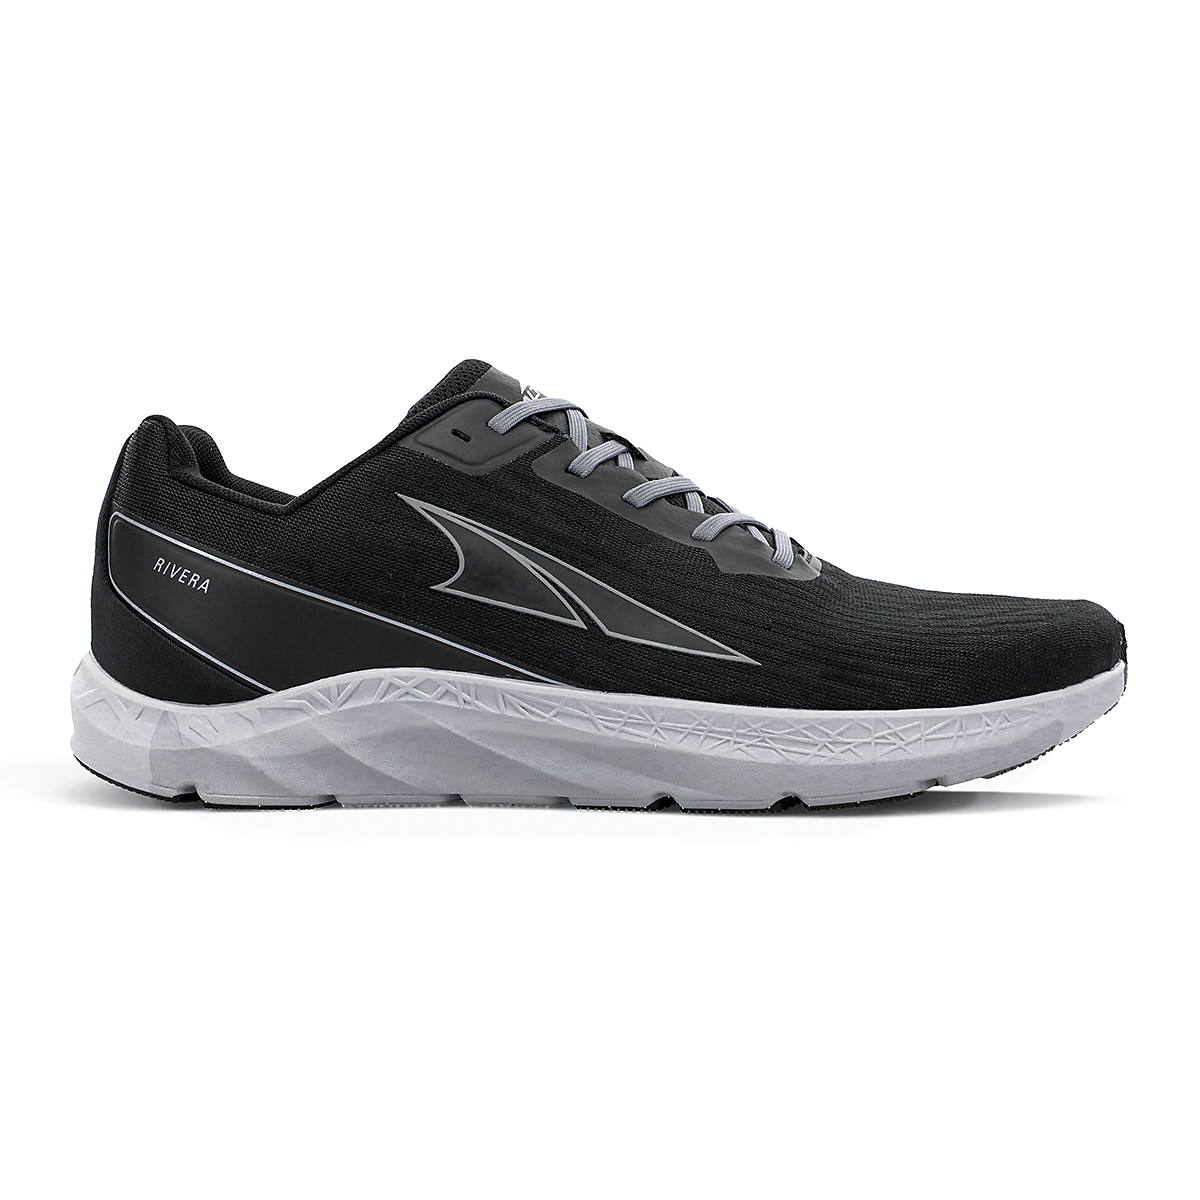 Men's Altra Rivera Running Shoe - Color: Black/Gray - Size: 7 - Width: Regular, Black/Gray, large, image 1